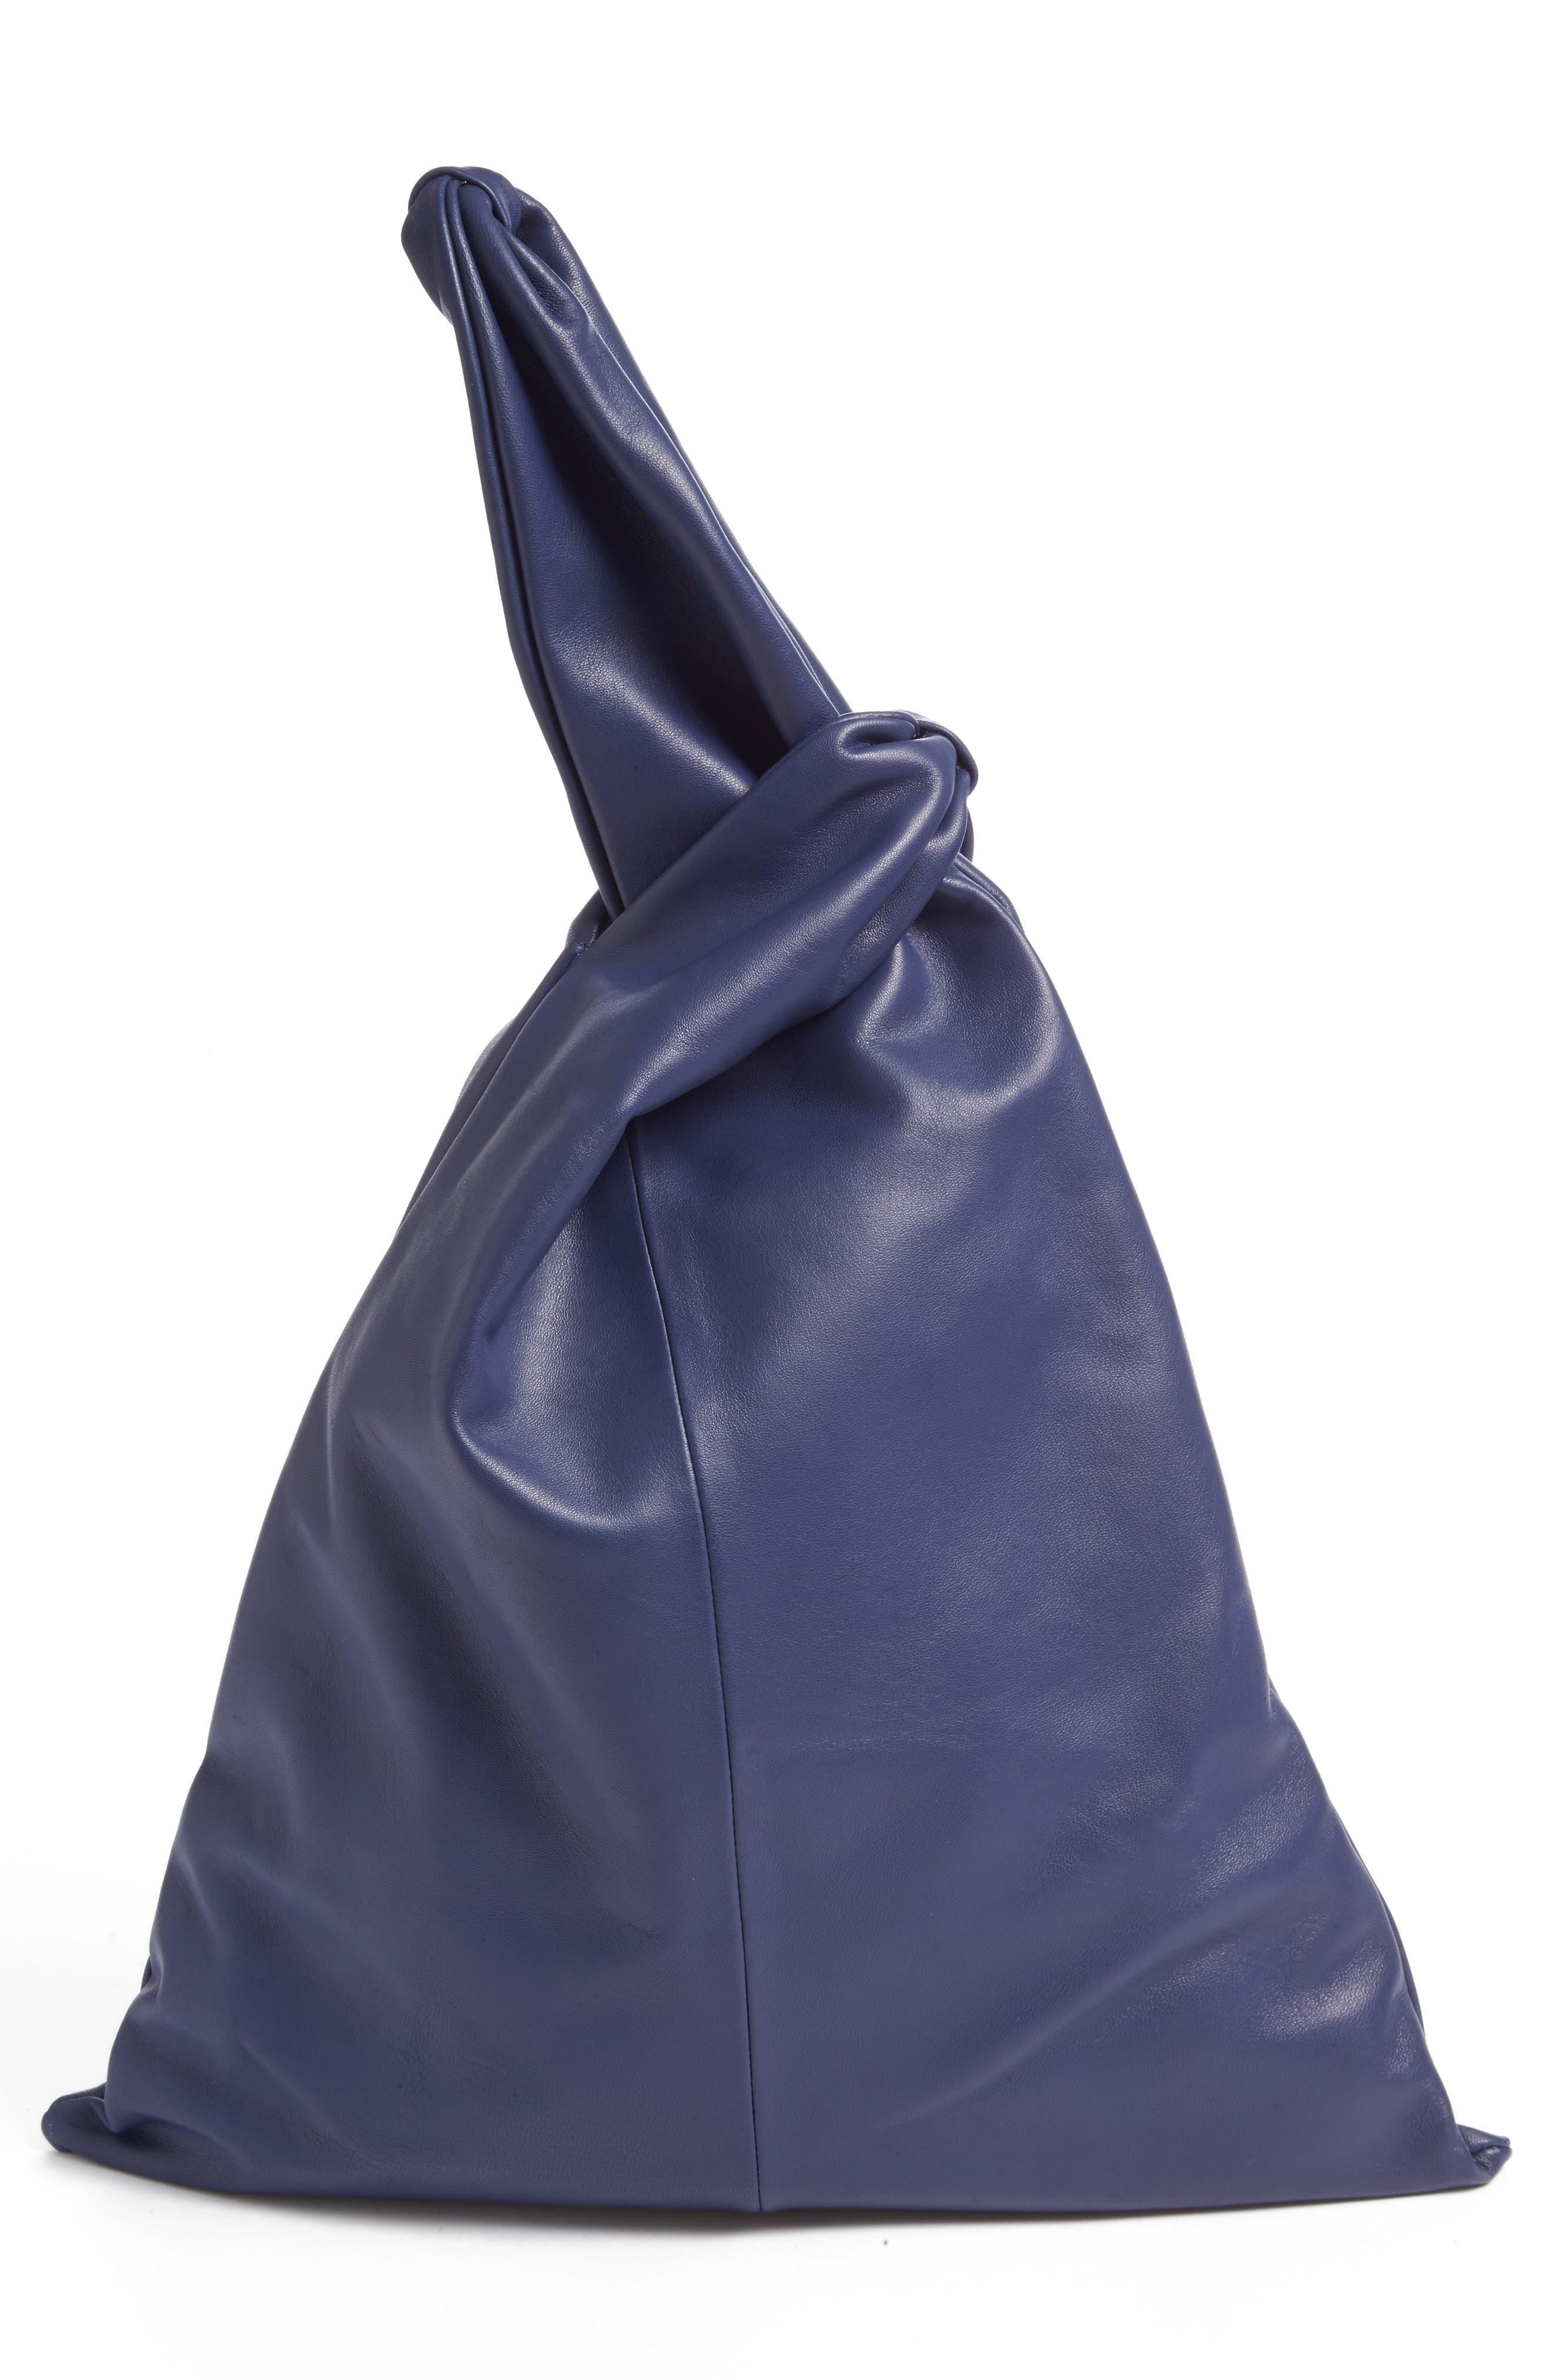 Main Image - Creatures of Comfort Large Nappa Leather Malia Bag